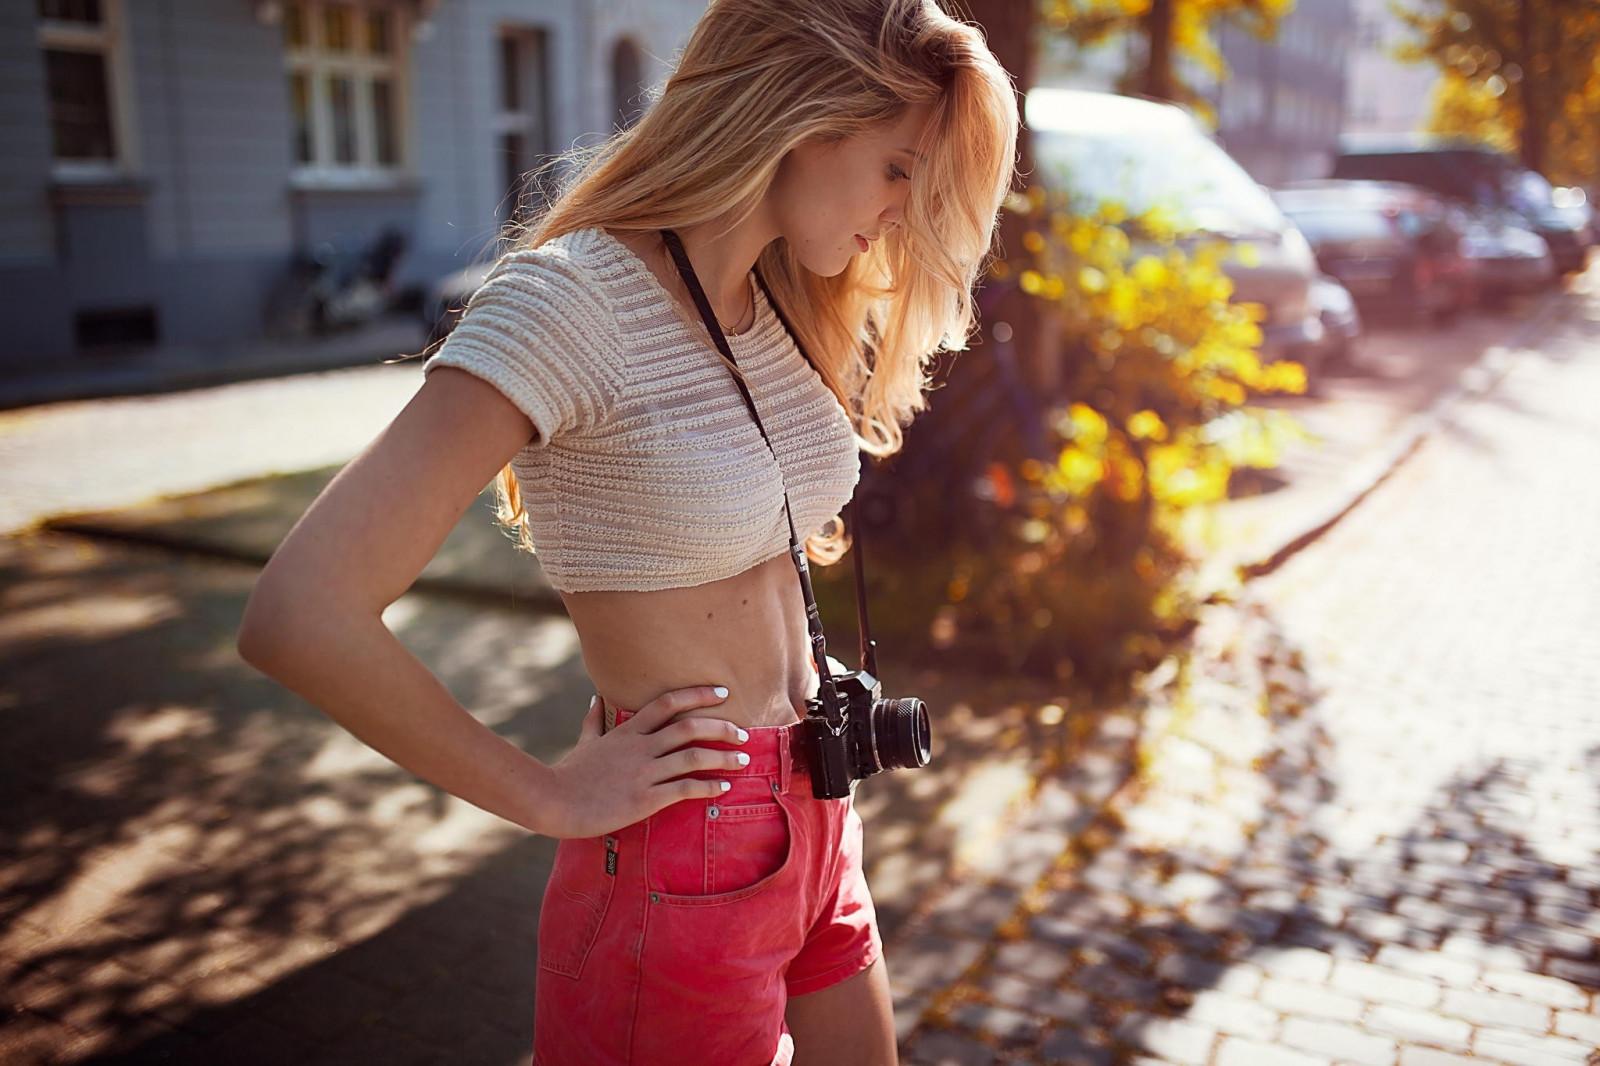 Заказать, картинки девушки блондинки без лица